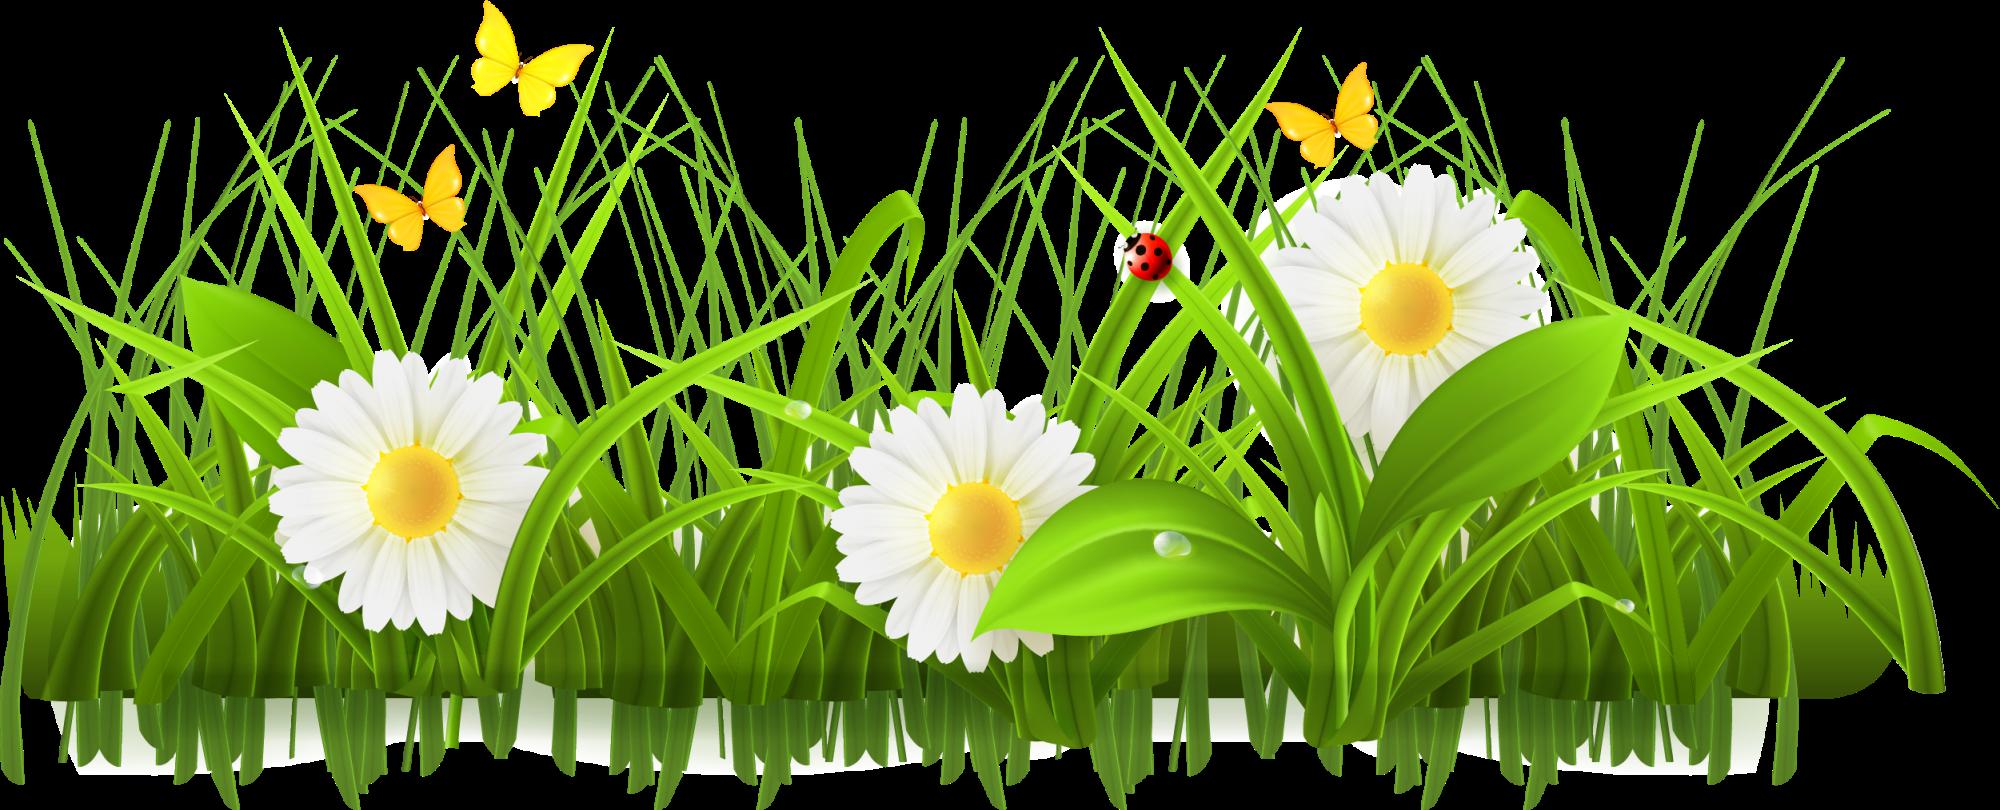 Daisy clipart springtime flower. Spring stock photography clip